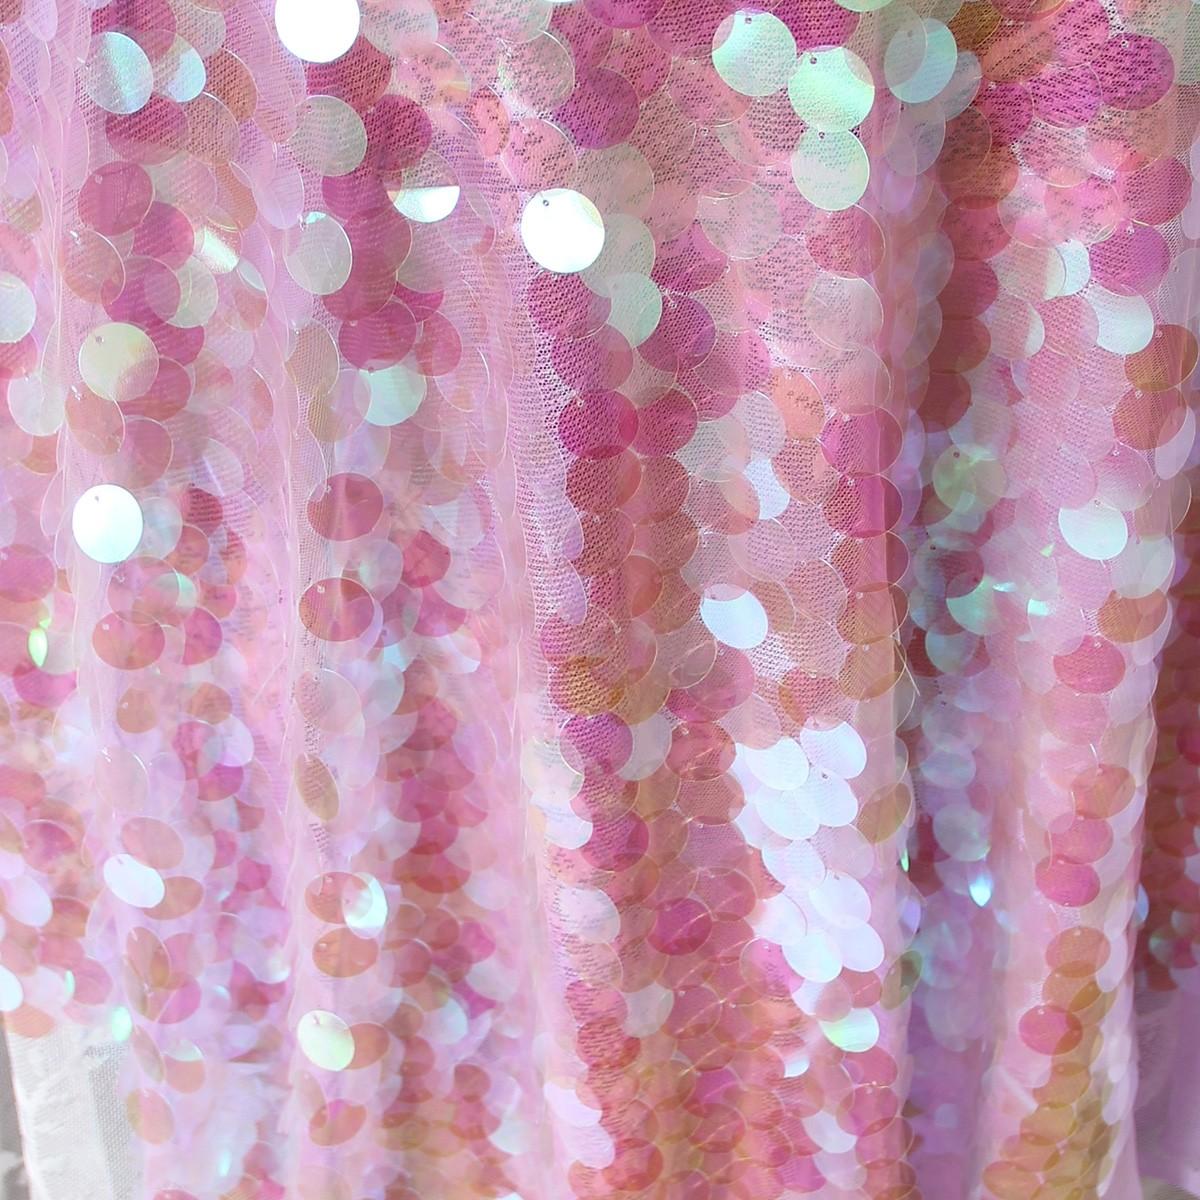 Purple Blink Iridescent Holographic Sequin Fabric